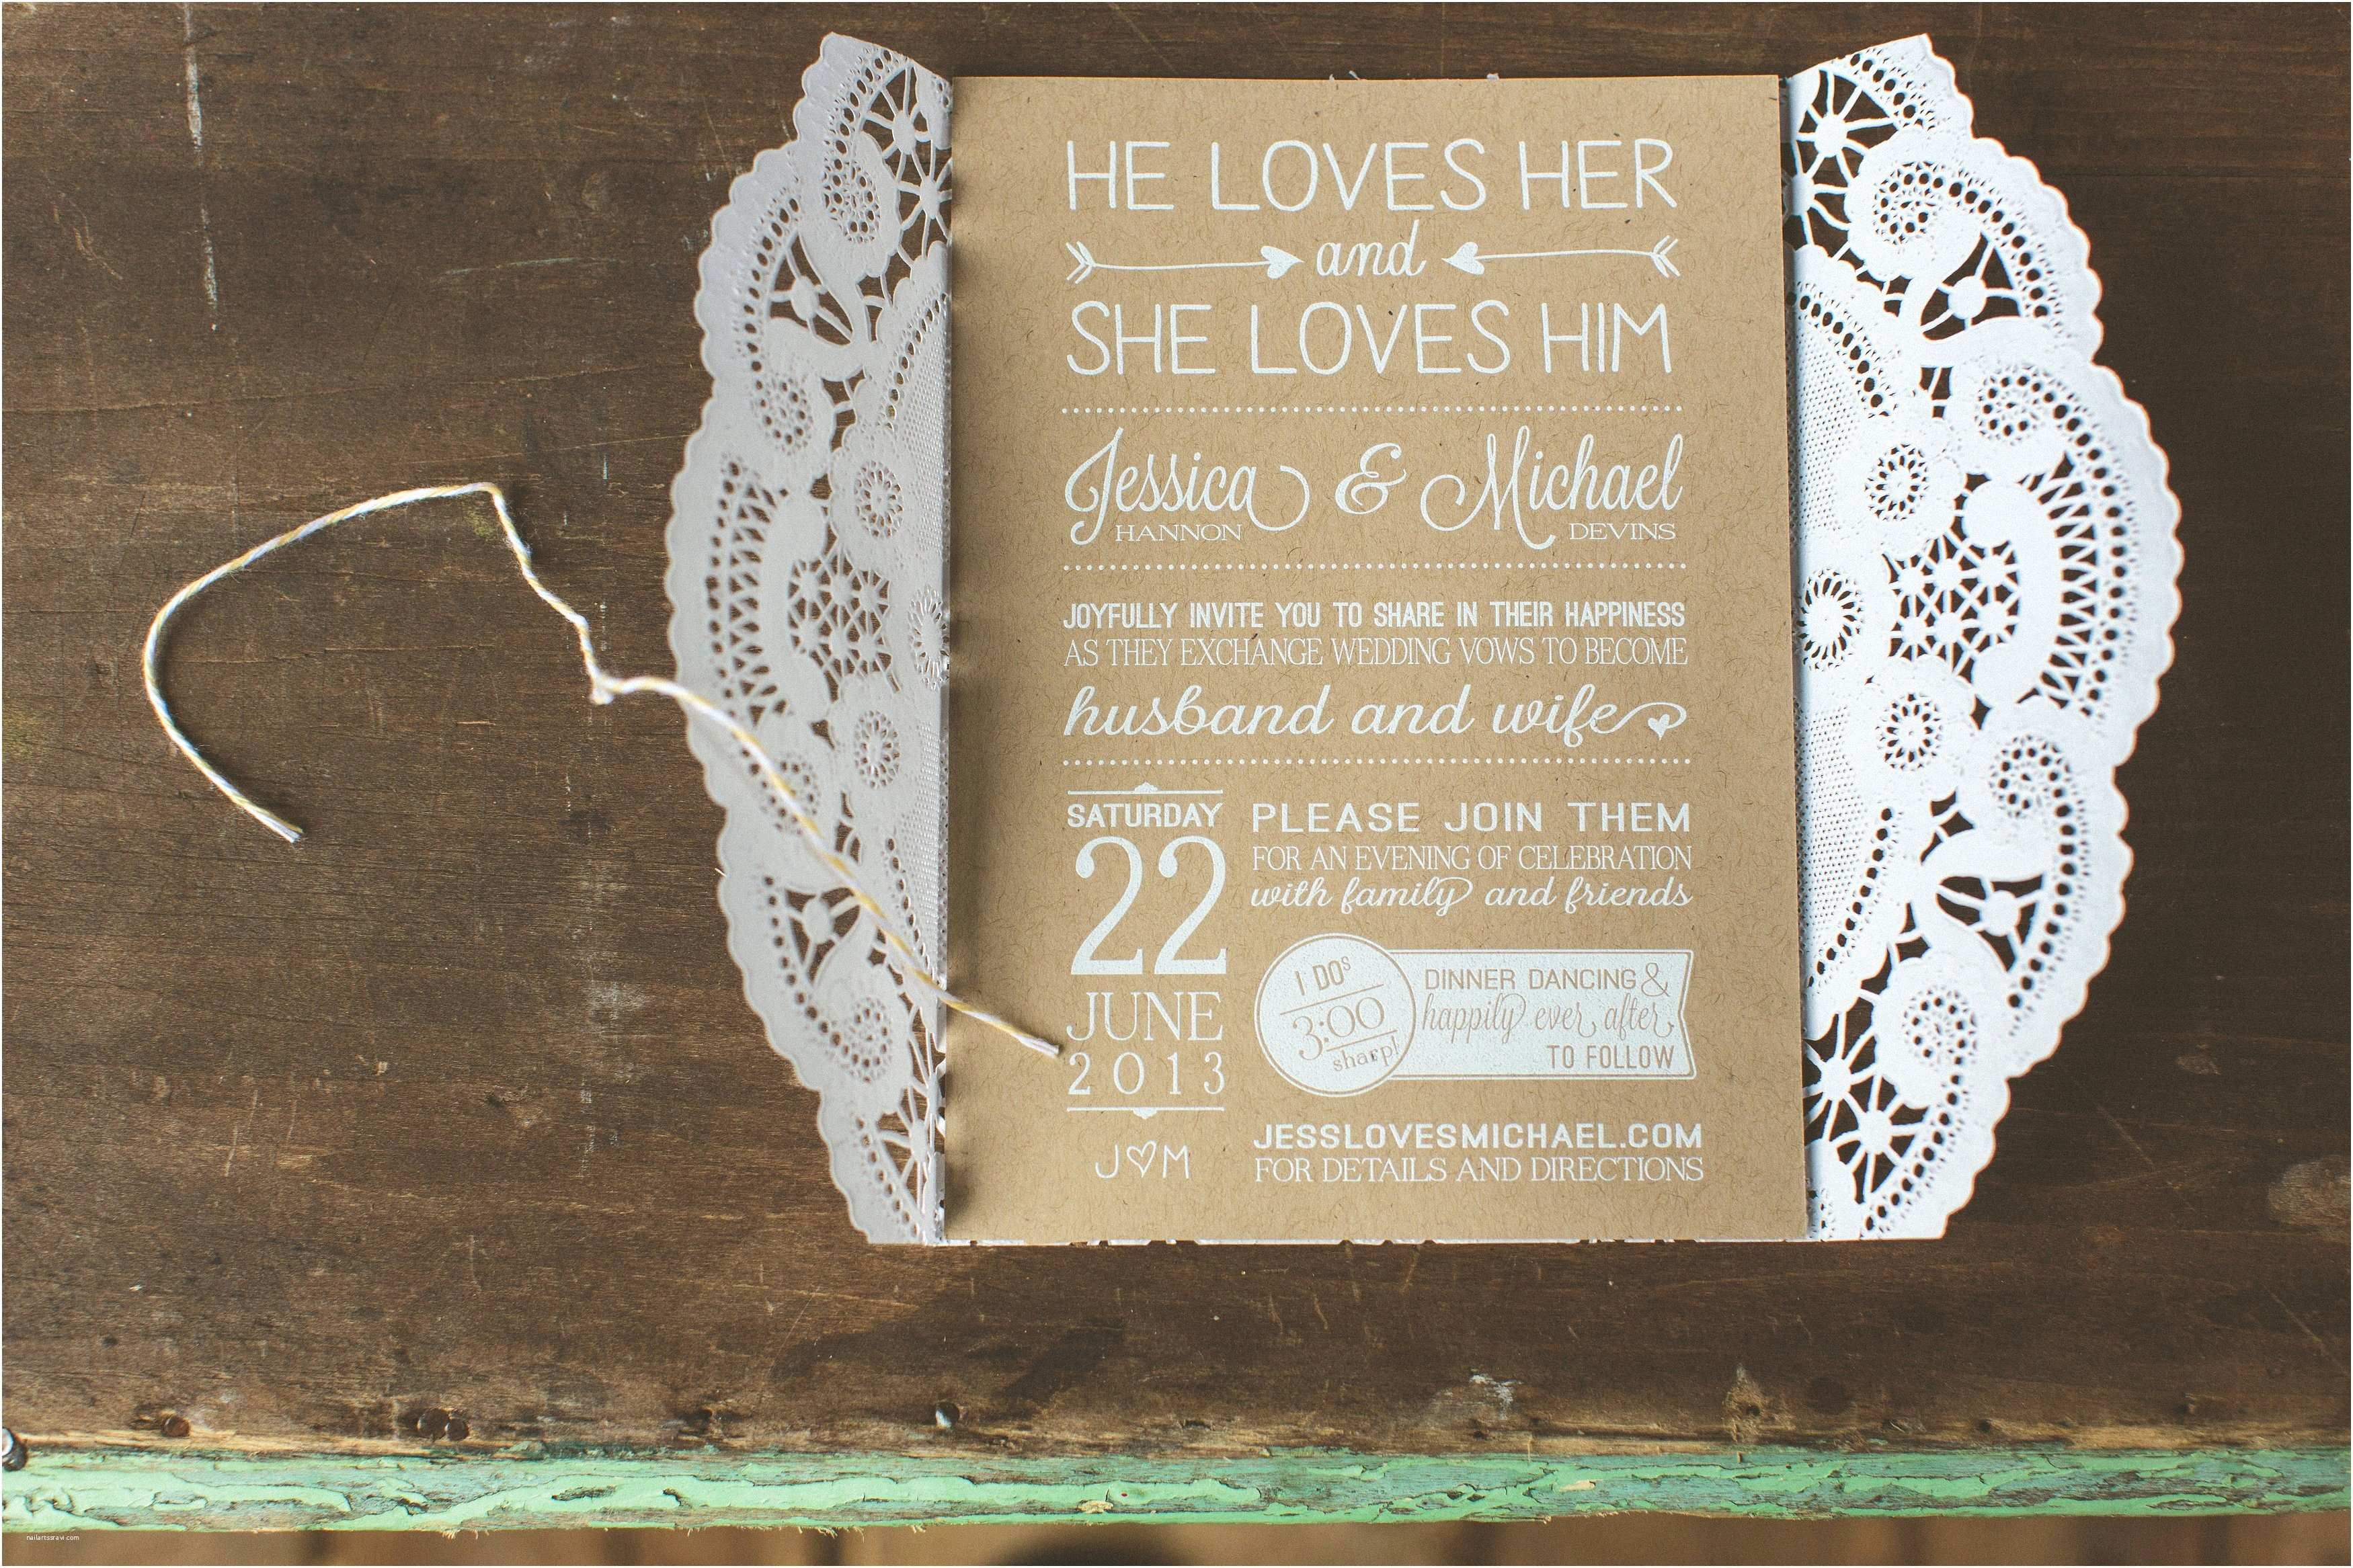 Self Made Wedding Invitations Free Diy Rustic Wedding Invitations Templates Diy Do It